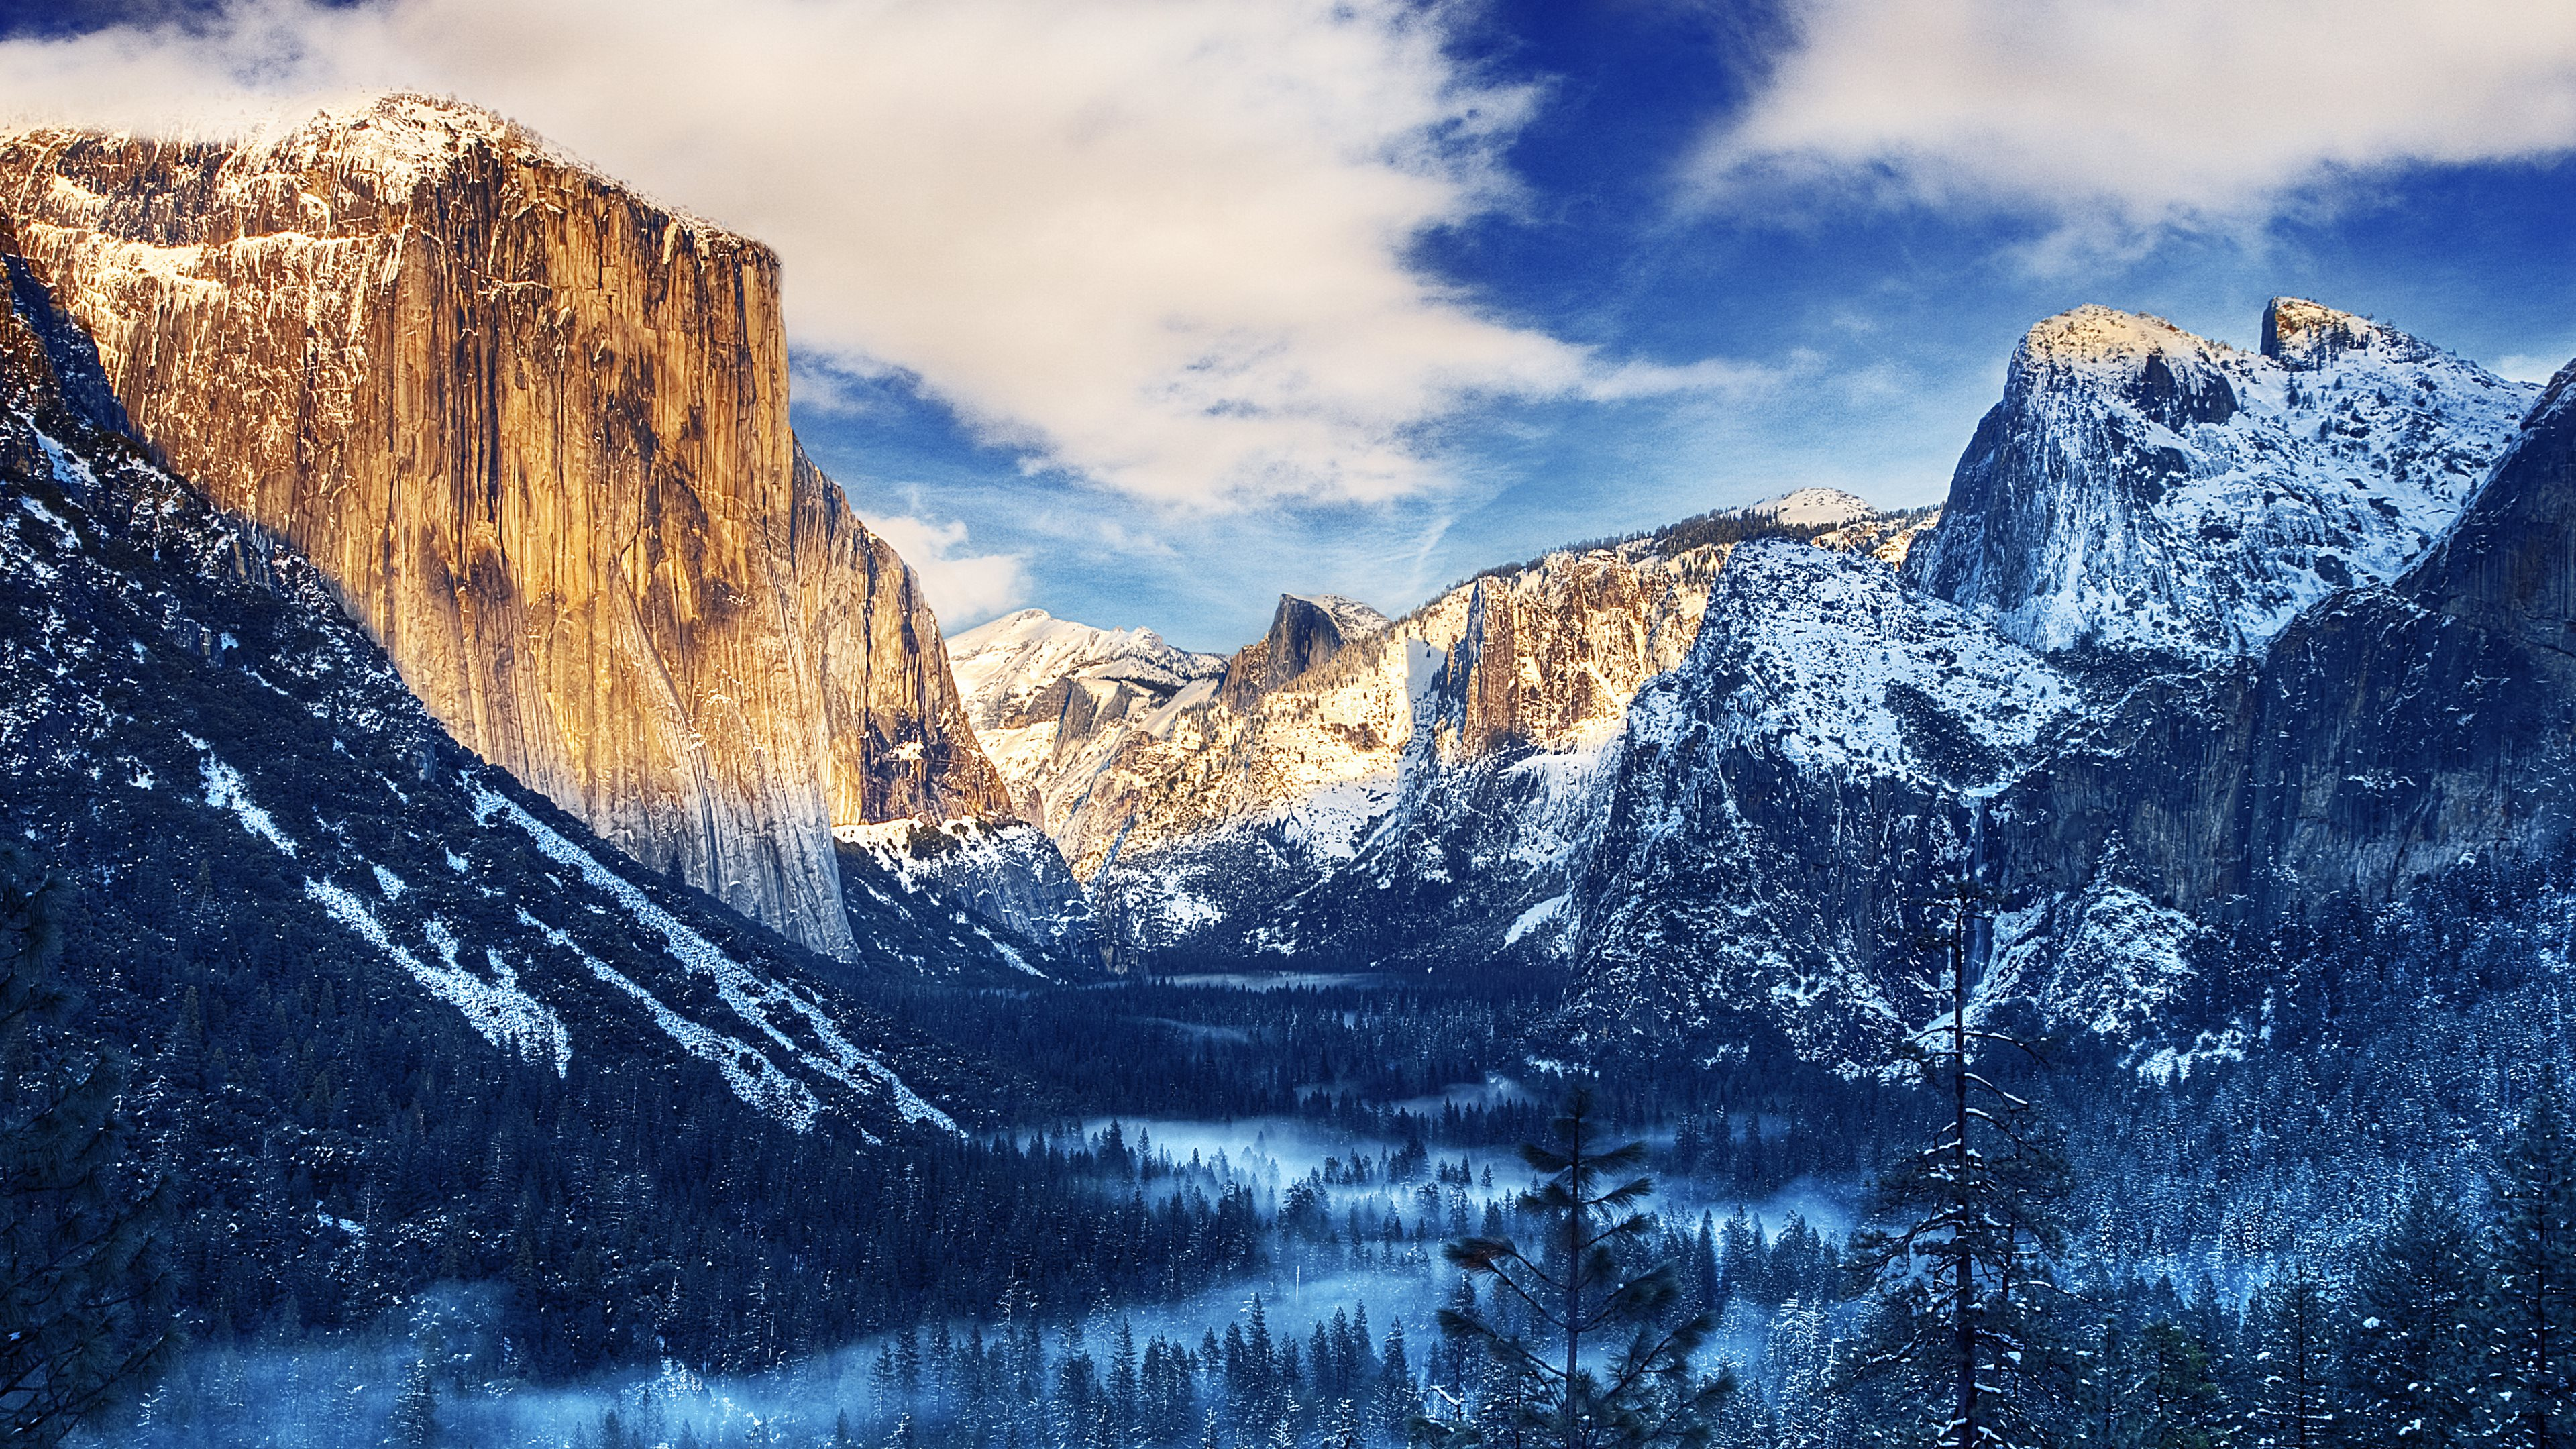 Winter Morning Sunrise   Tunnel View in Yosemite Valley Yosemite 3840x2160